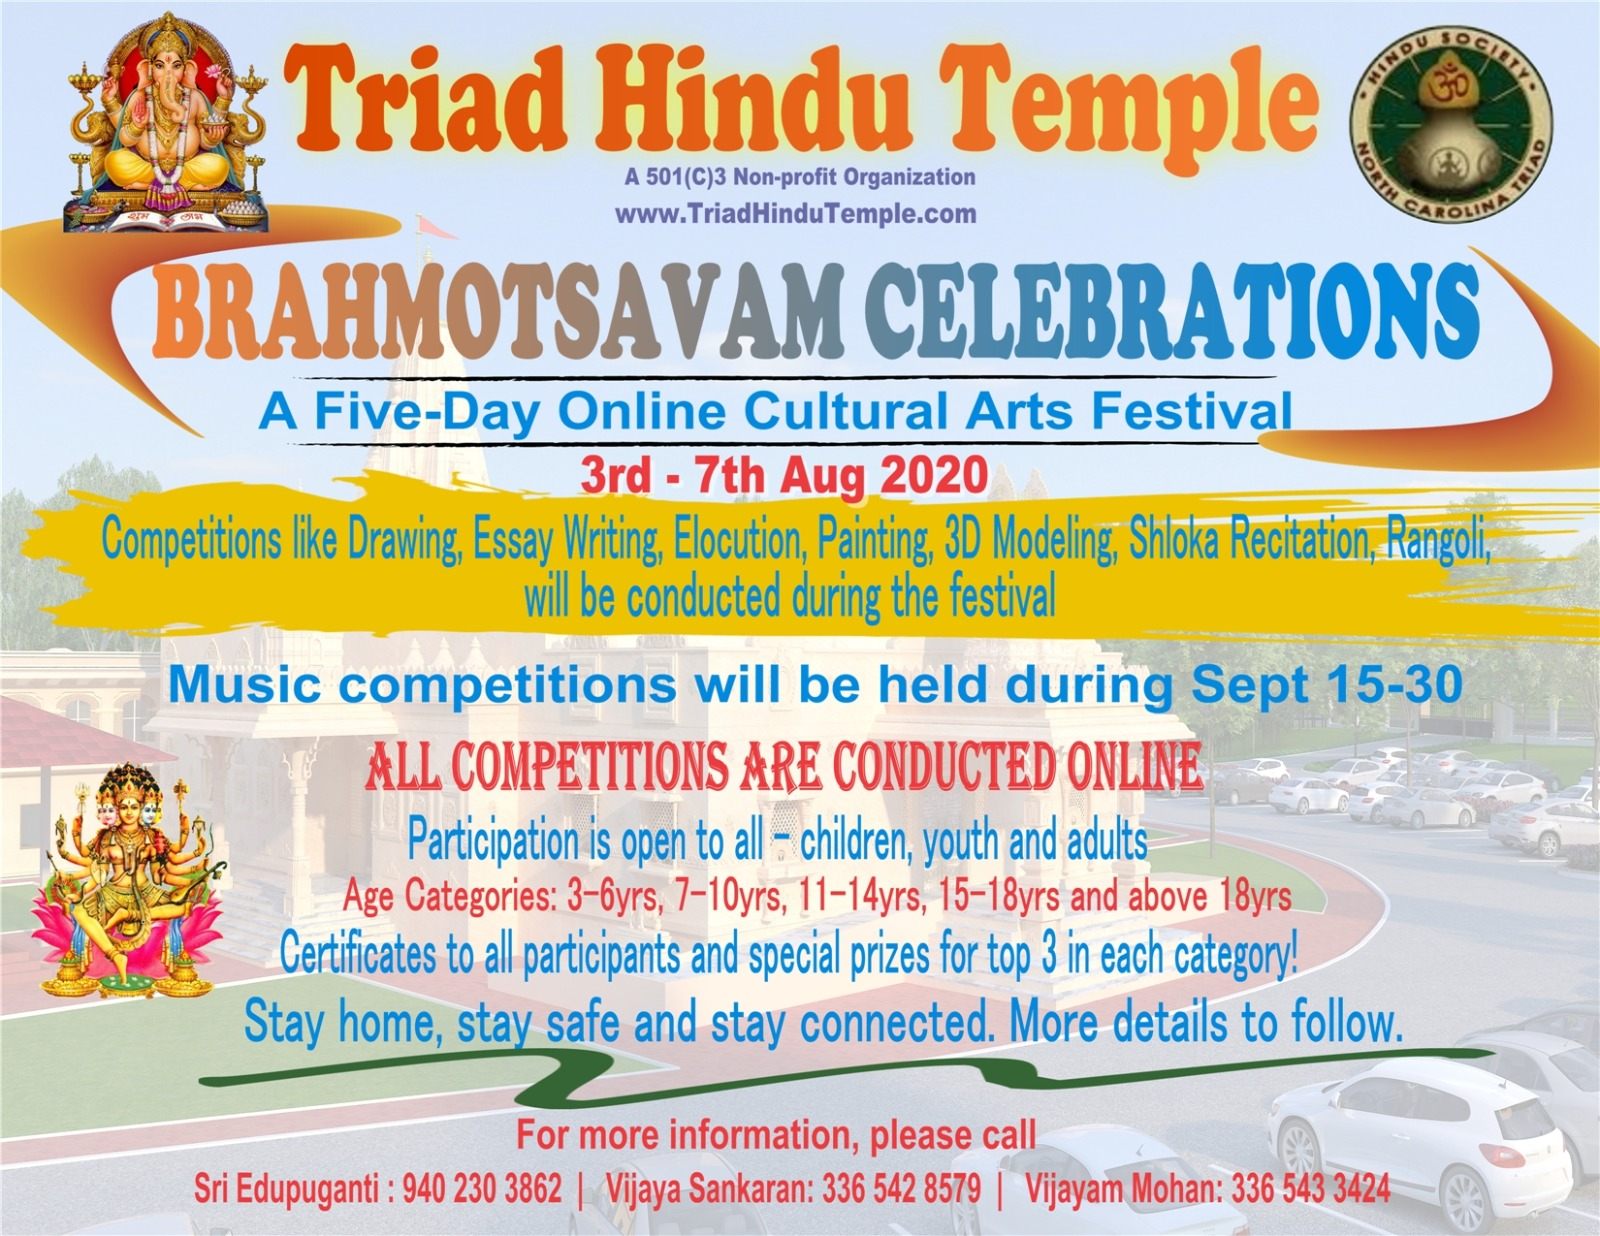 THT's Brahmotsavam Online Competitions